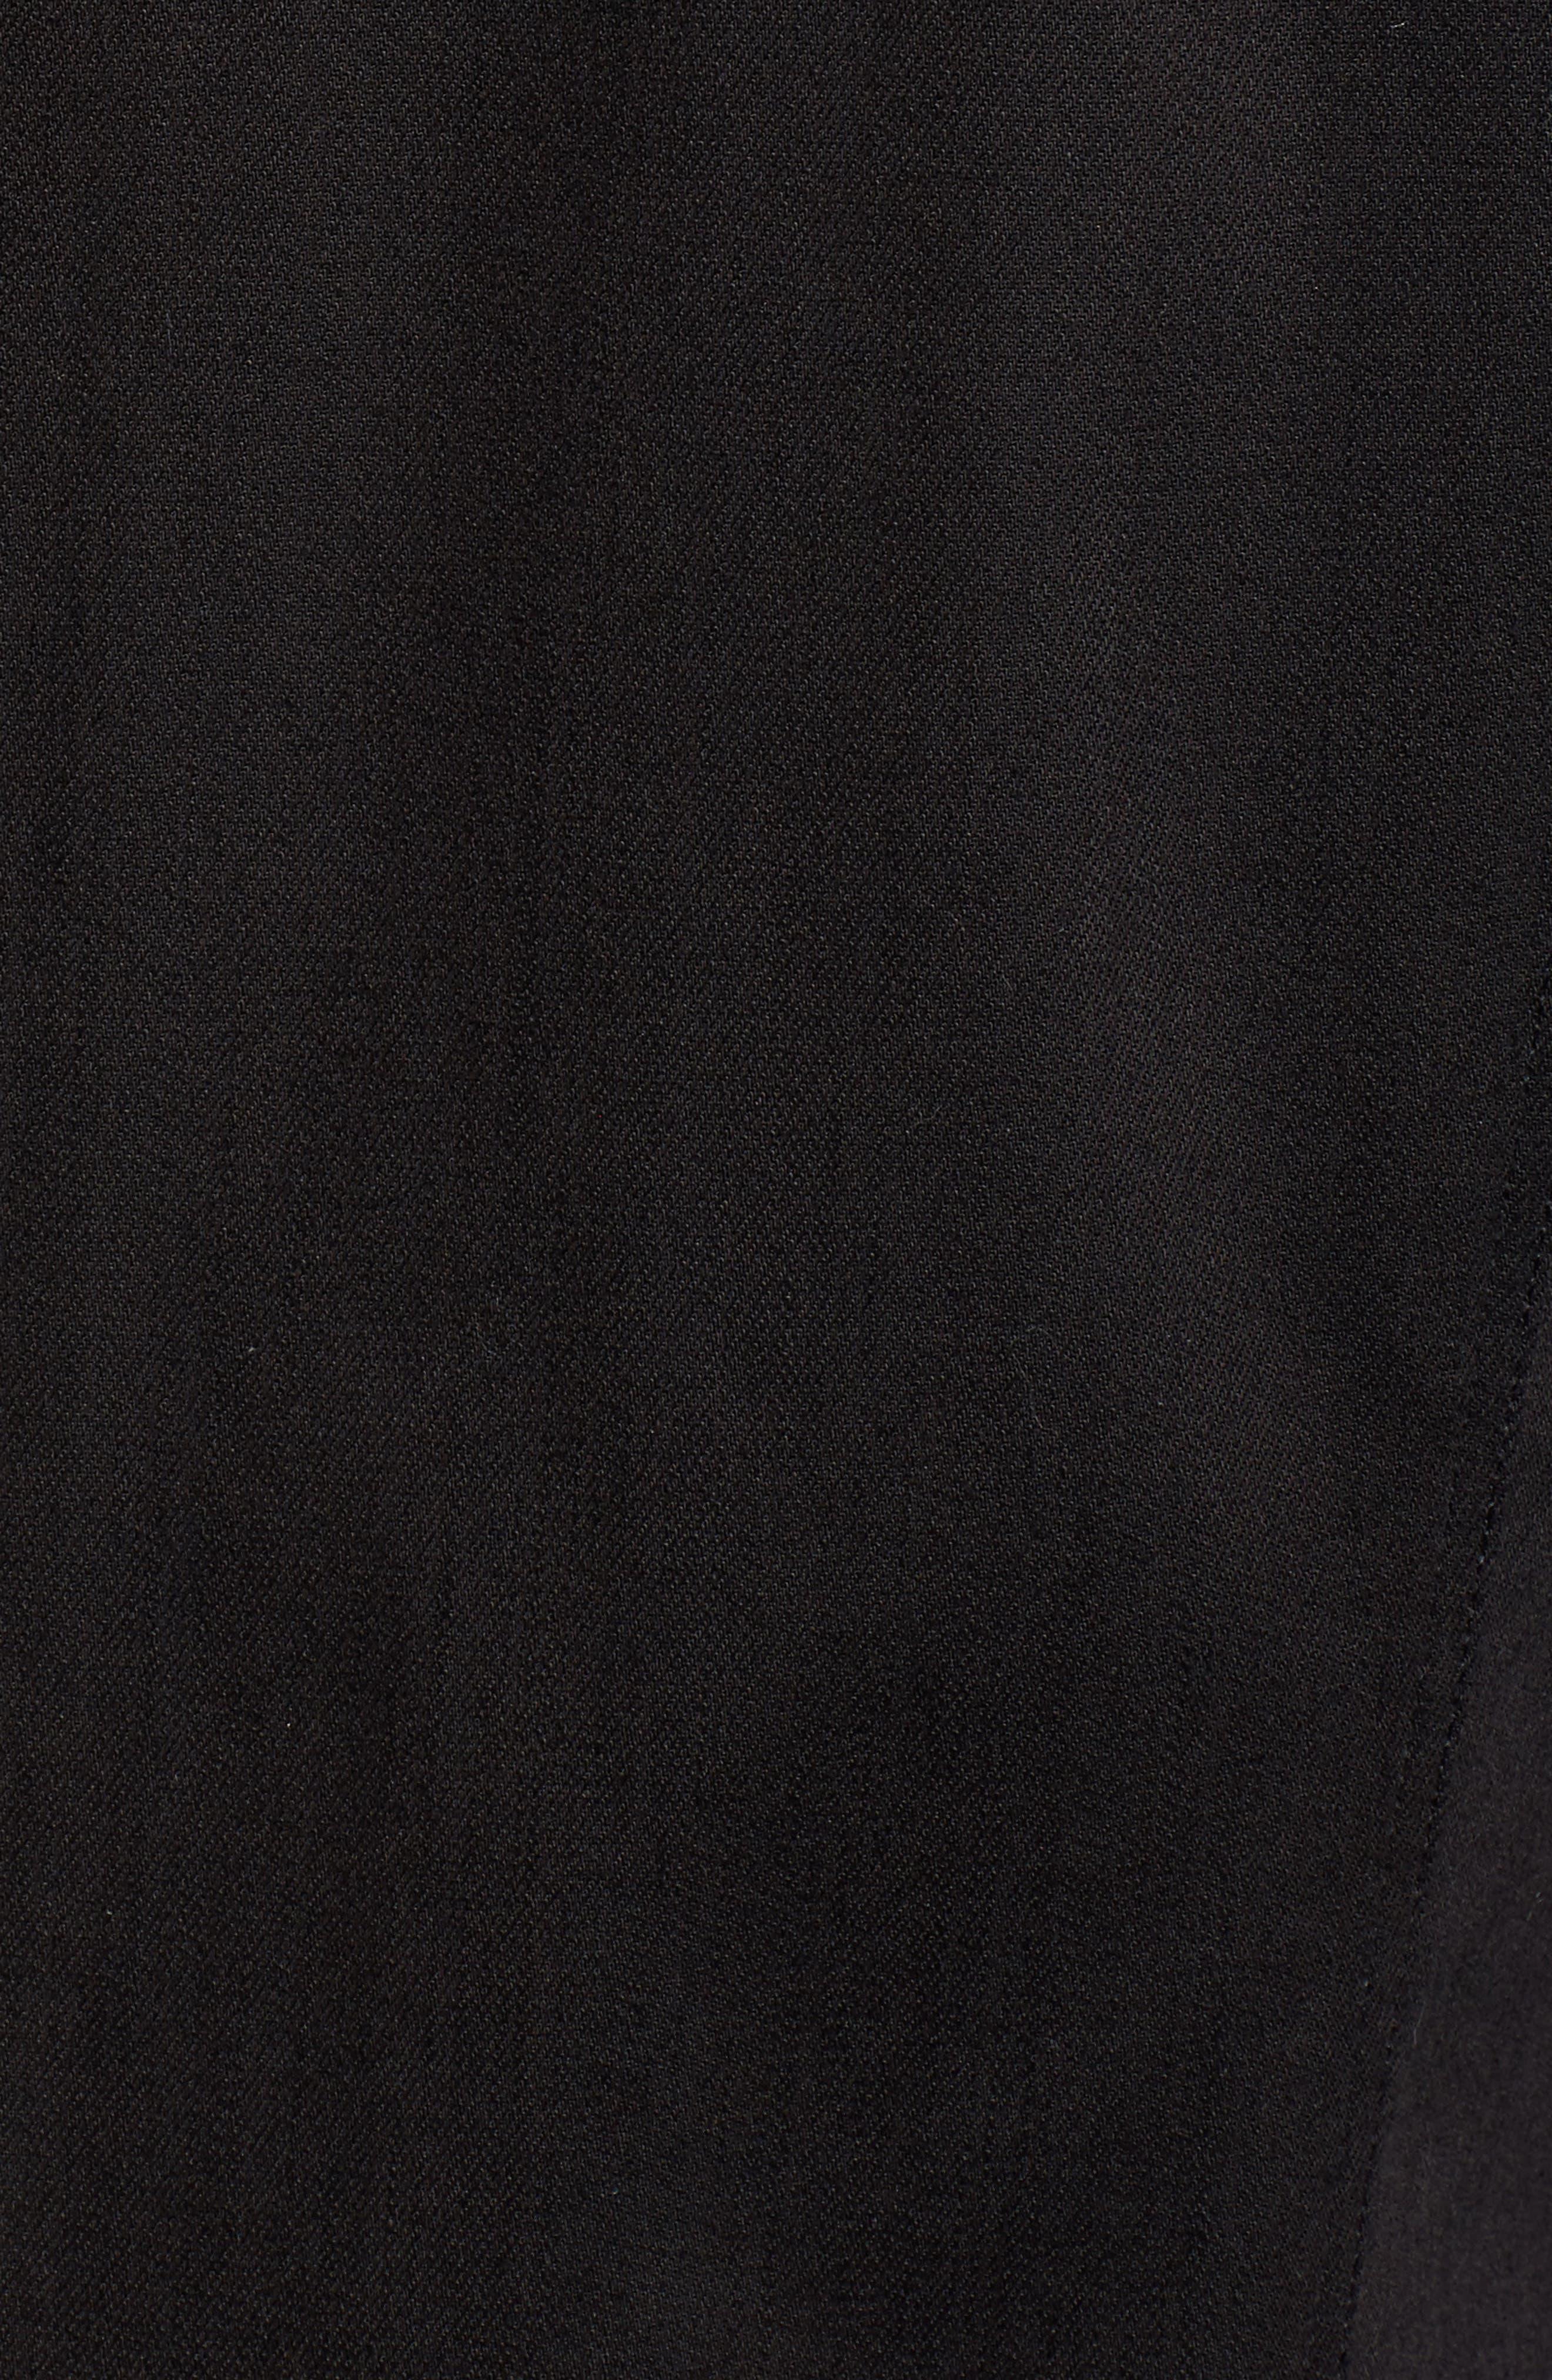 Vodan 3D Slim Jacket,                             Alternate thumbnail 6, color,                             401